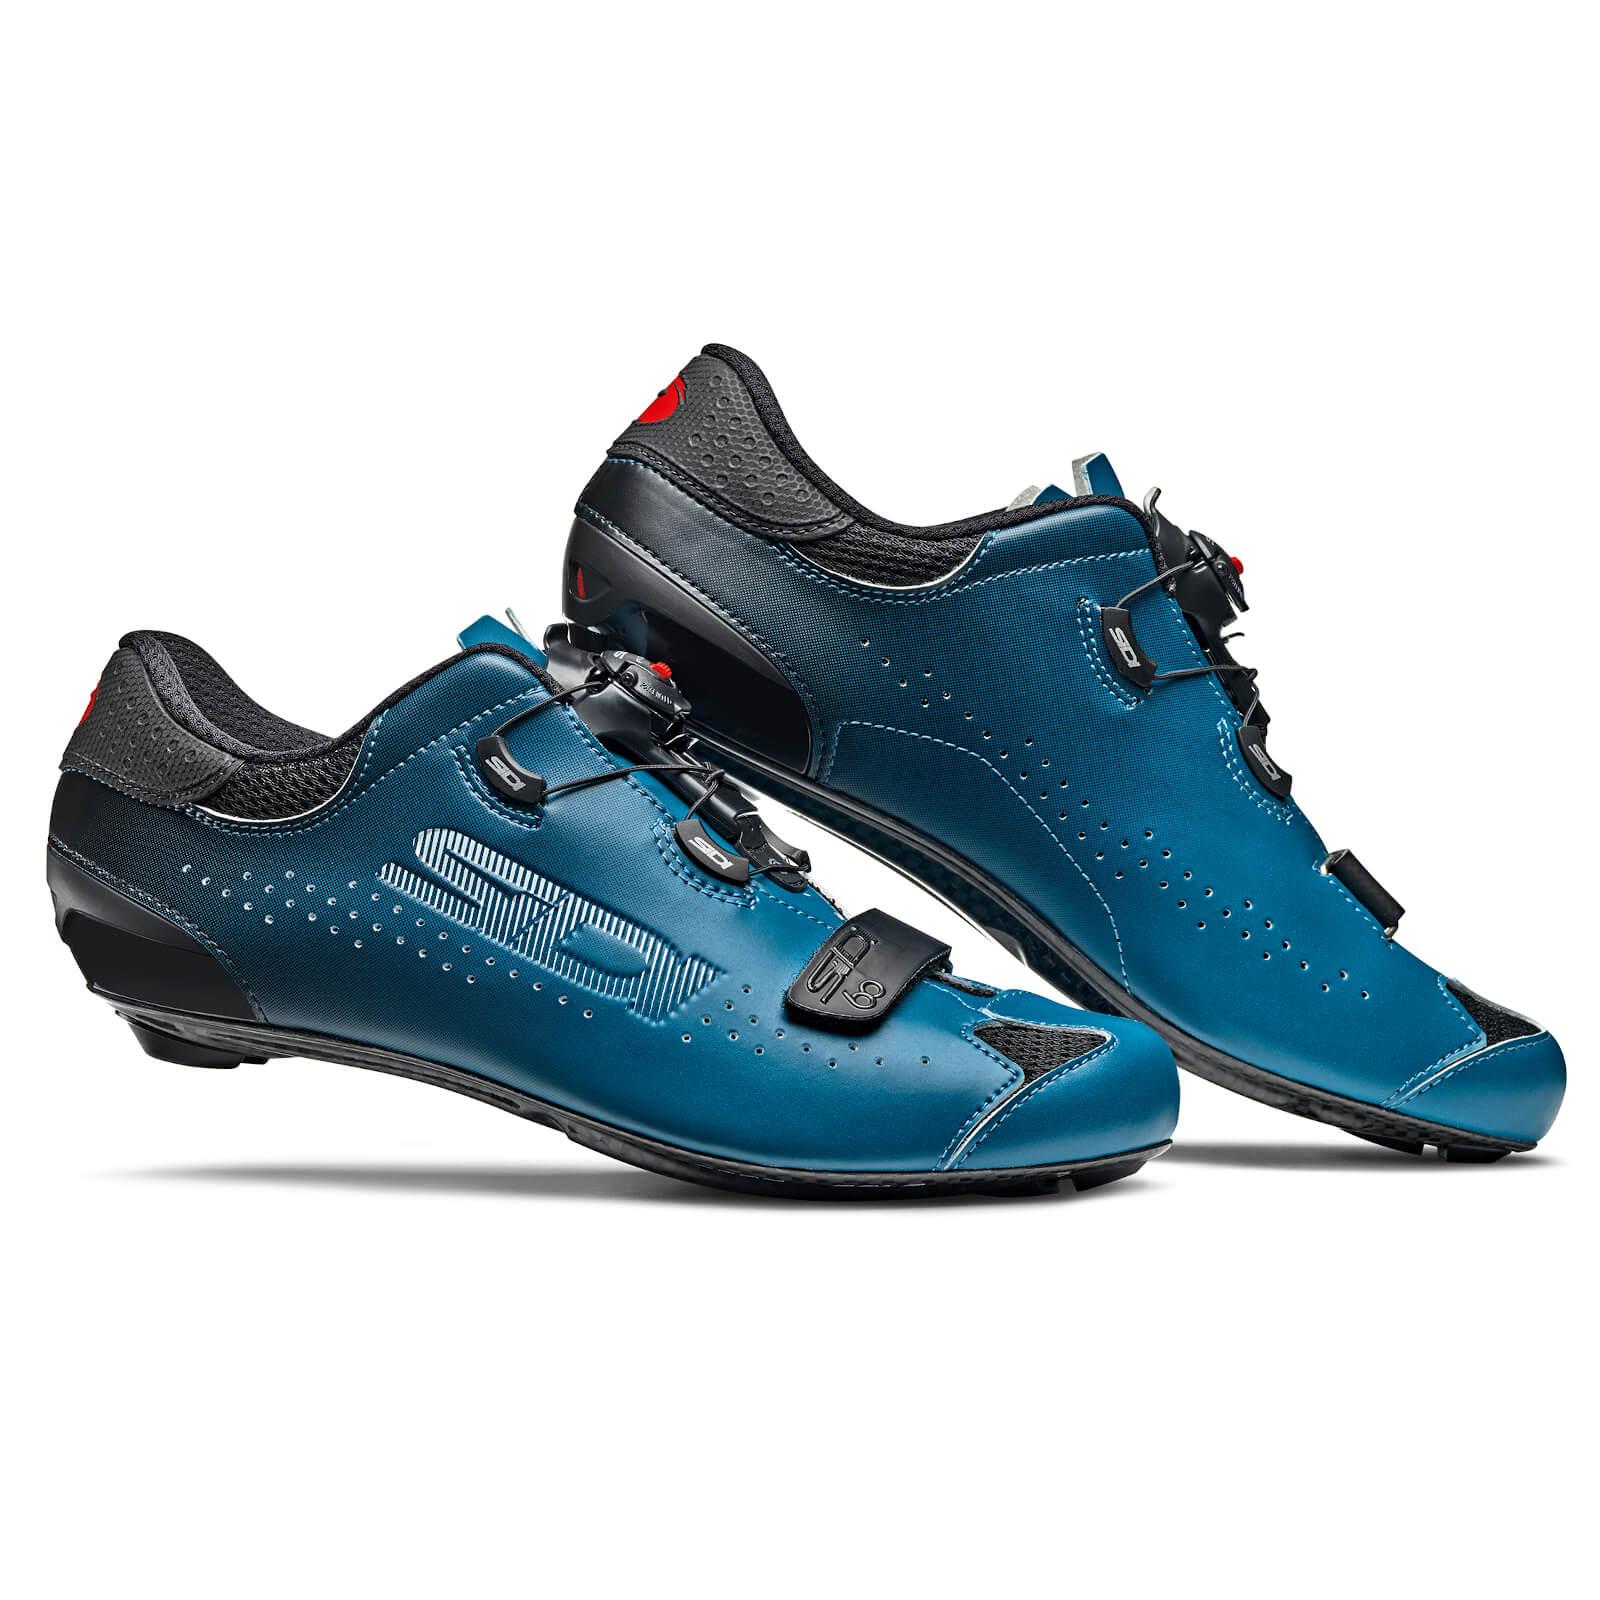 Image of Sidi Sixty Road Shoes - Black/Petrol - EU 43